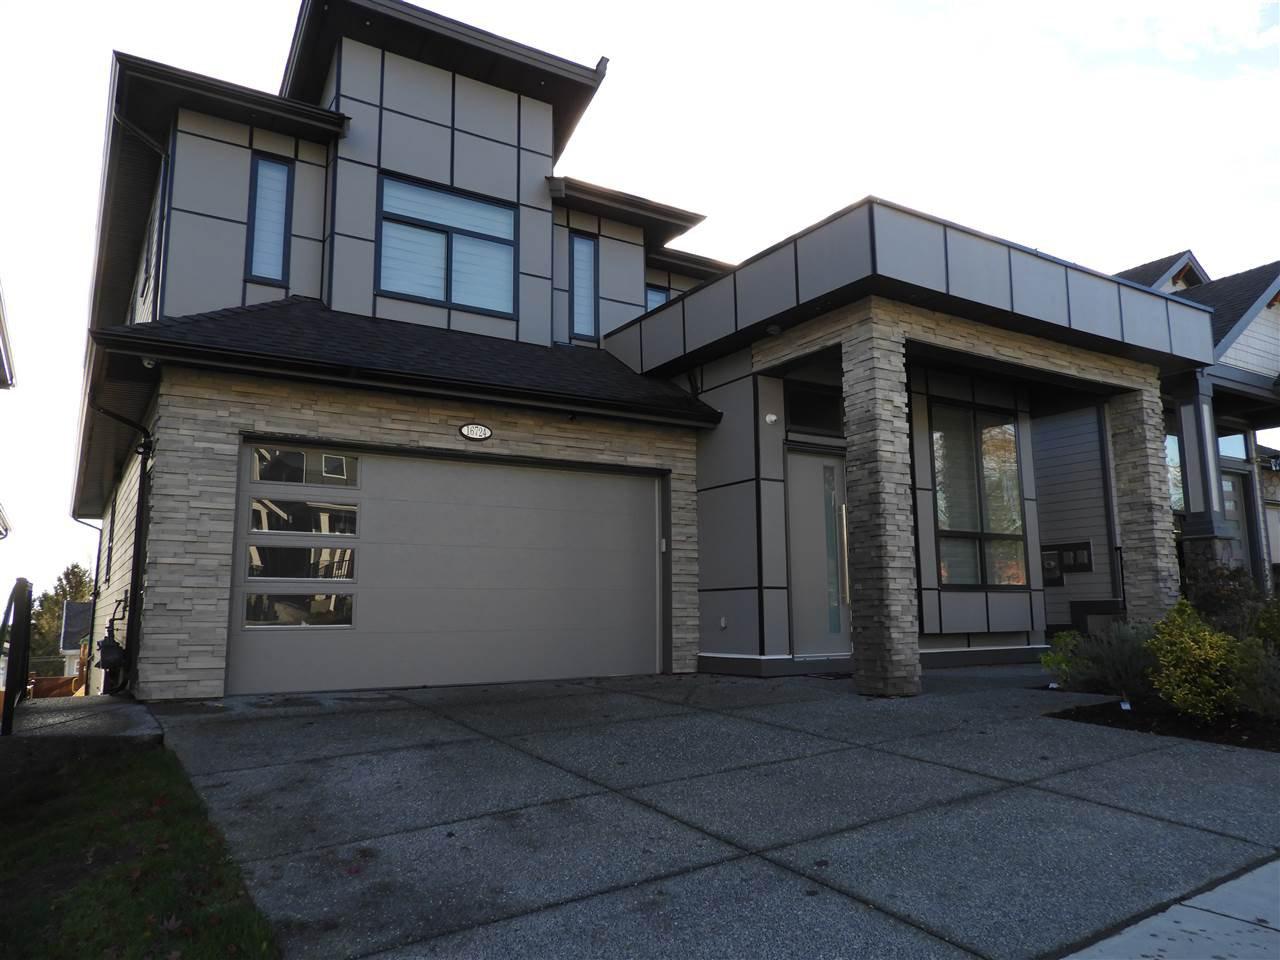 Main Photo: 16724 16A Avenue in Surrey: Grandview Surrey House for sale (South Surrey White Rock)  : MLS®# R2517177